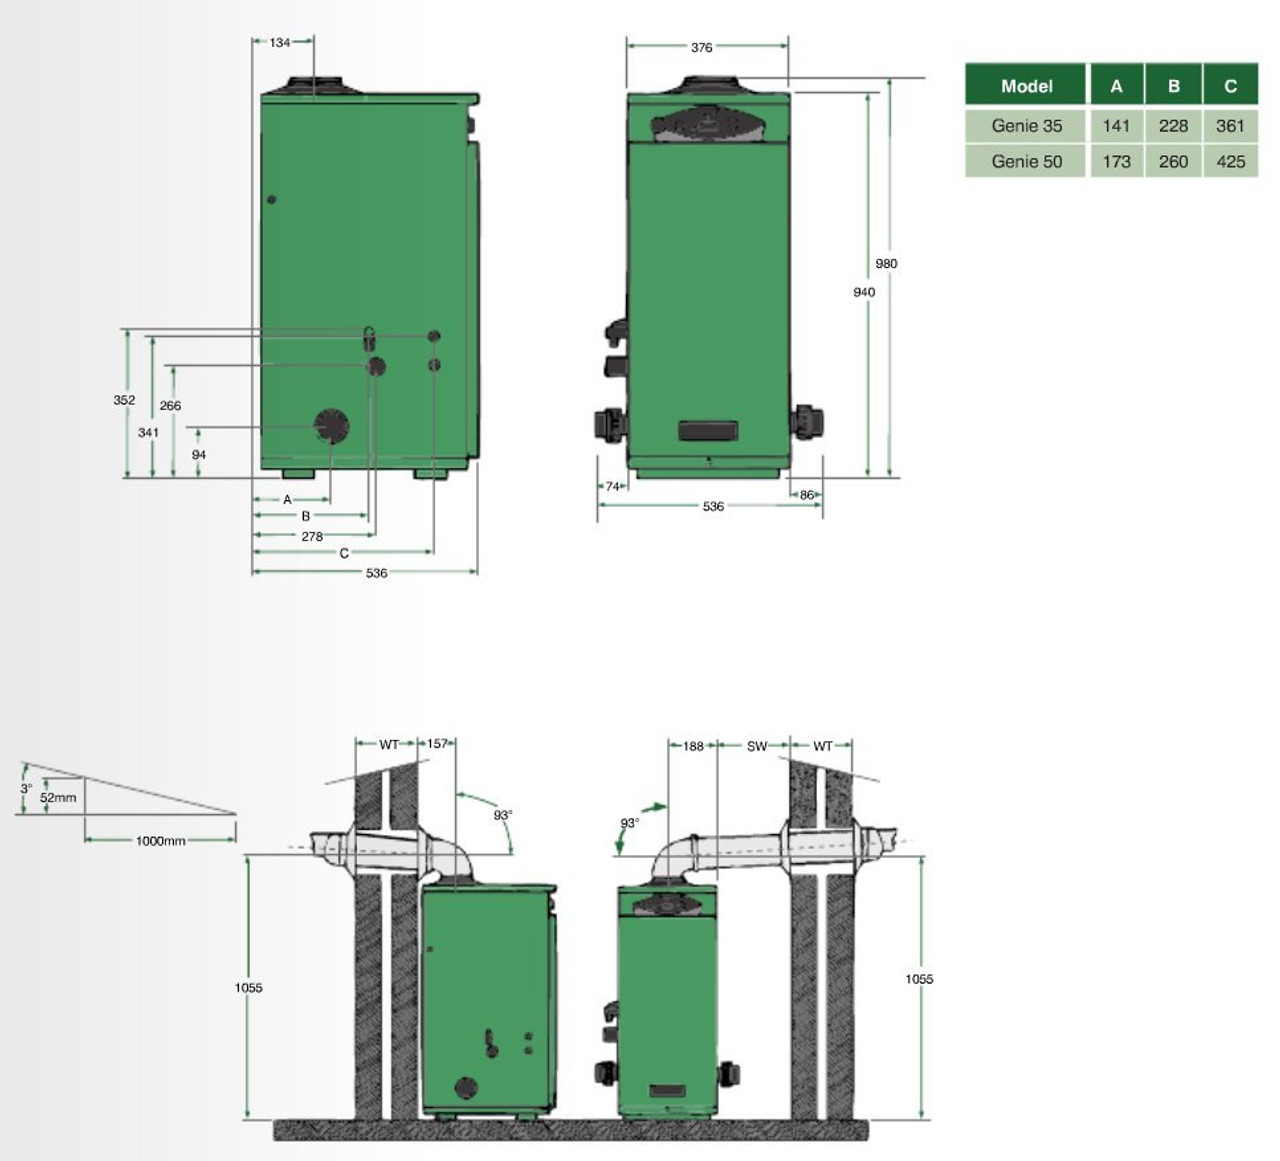 Genie condensing boiler swimming pool heater